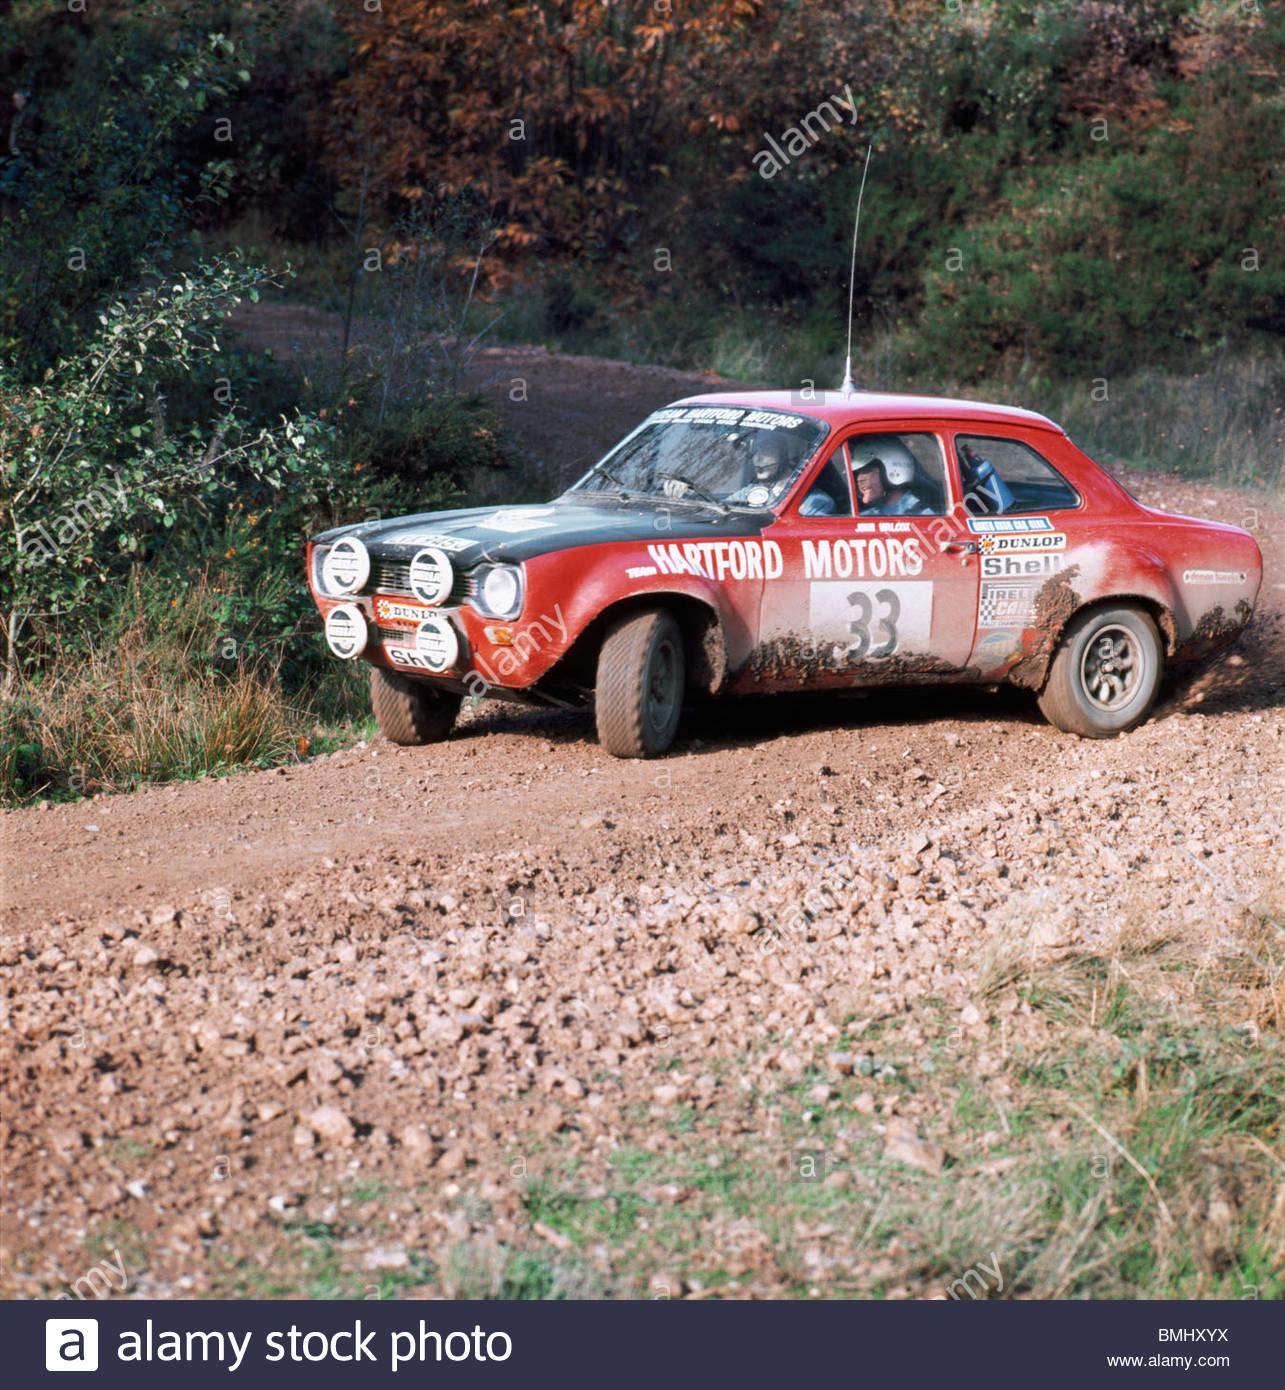 Ford Escort-Rallye-Auto; England, UK ? 1976 Stockbild